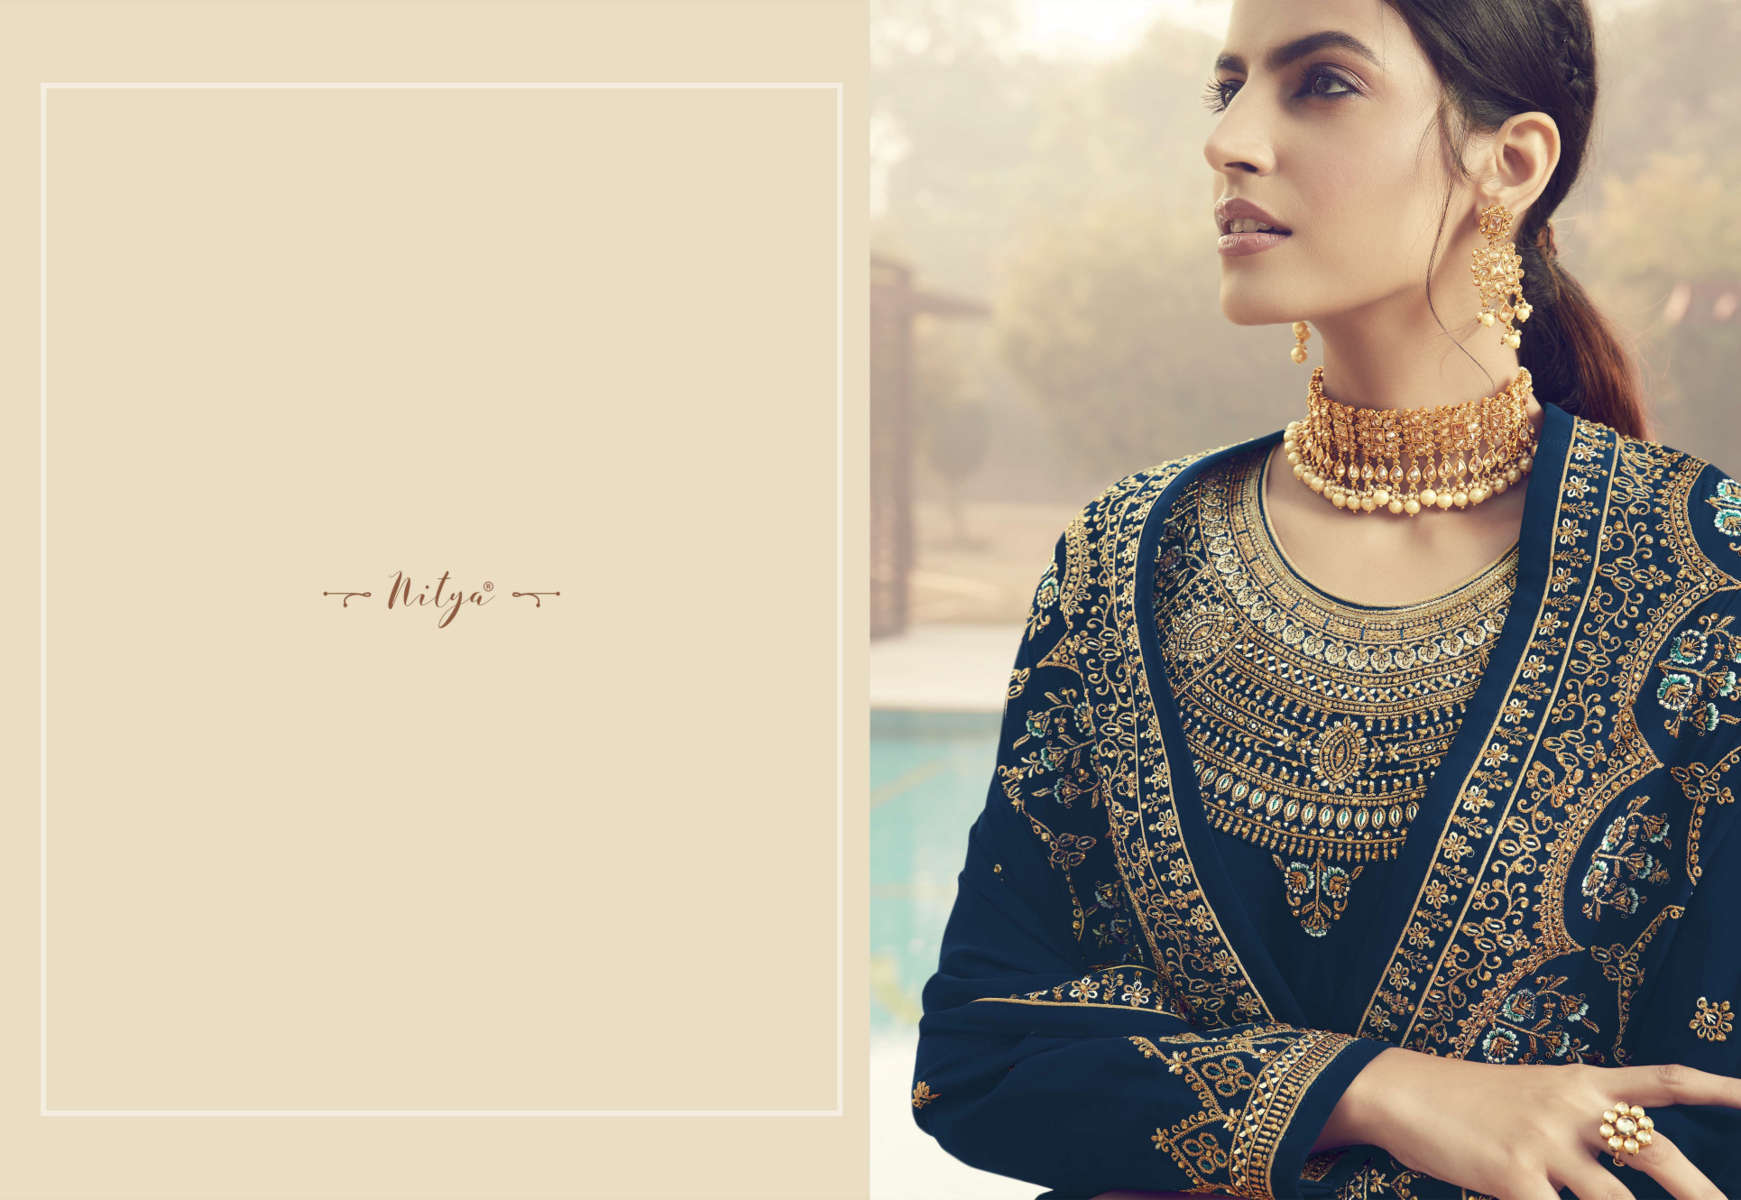 Lt Fabrics Nitya Zyrah Salwar Suit Wholesale Catalog 5 Pcs 1 1 - Lt Fabrics Nitya Zyrah Salwar Suit Wholesale Catalog 5 Pcs